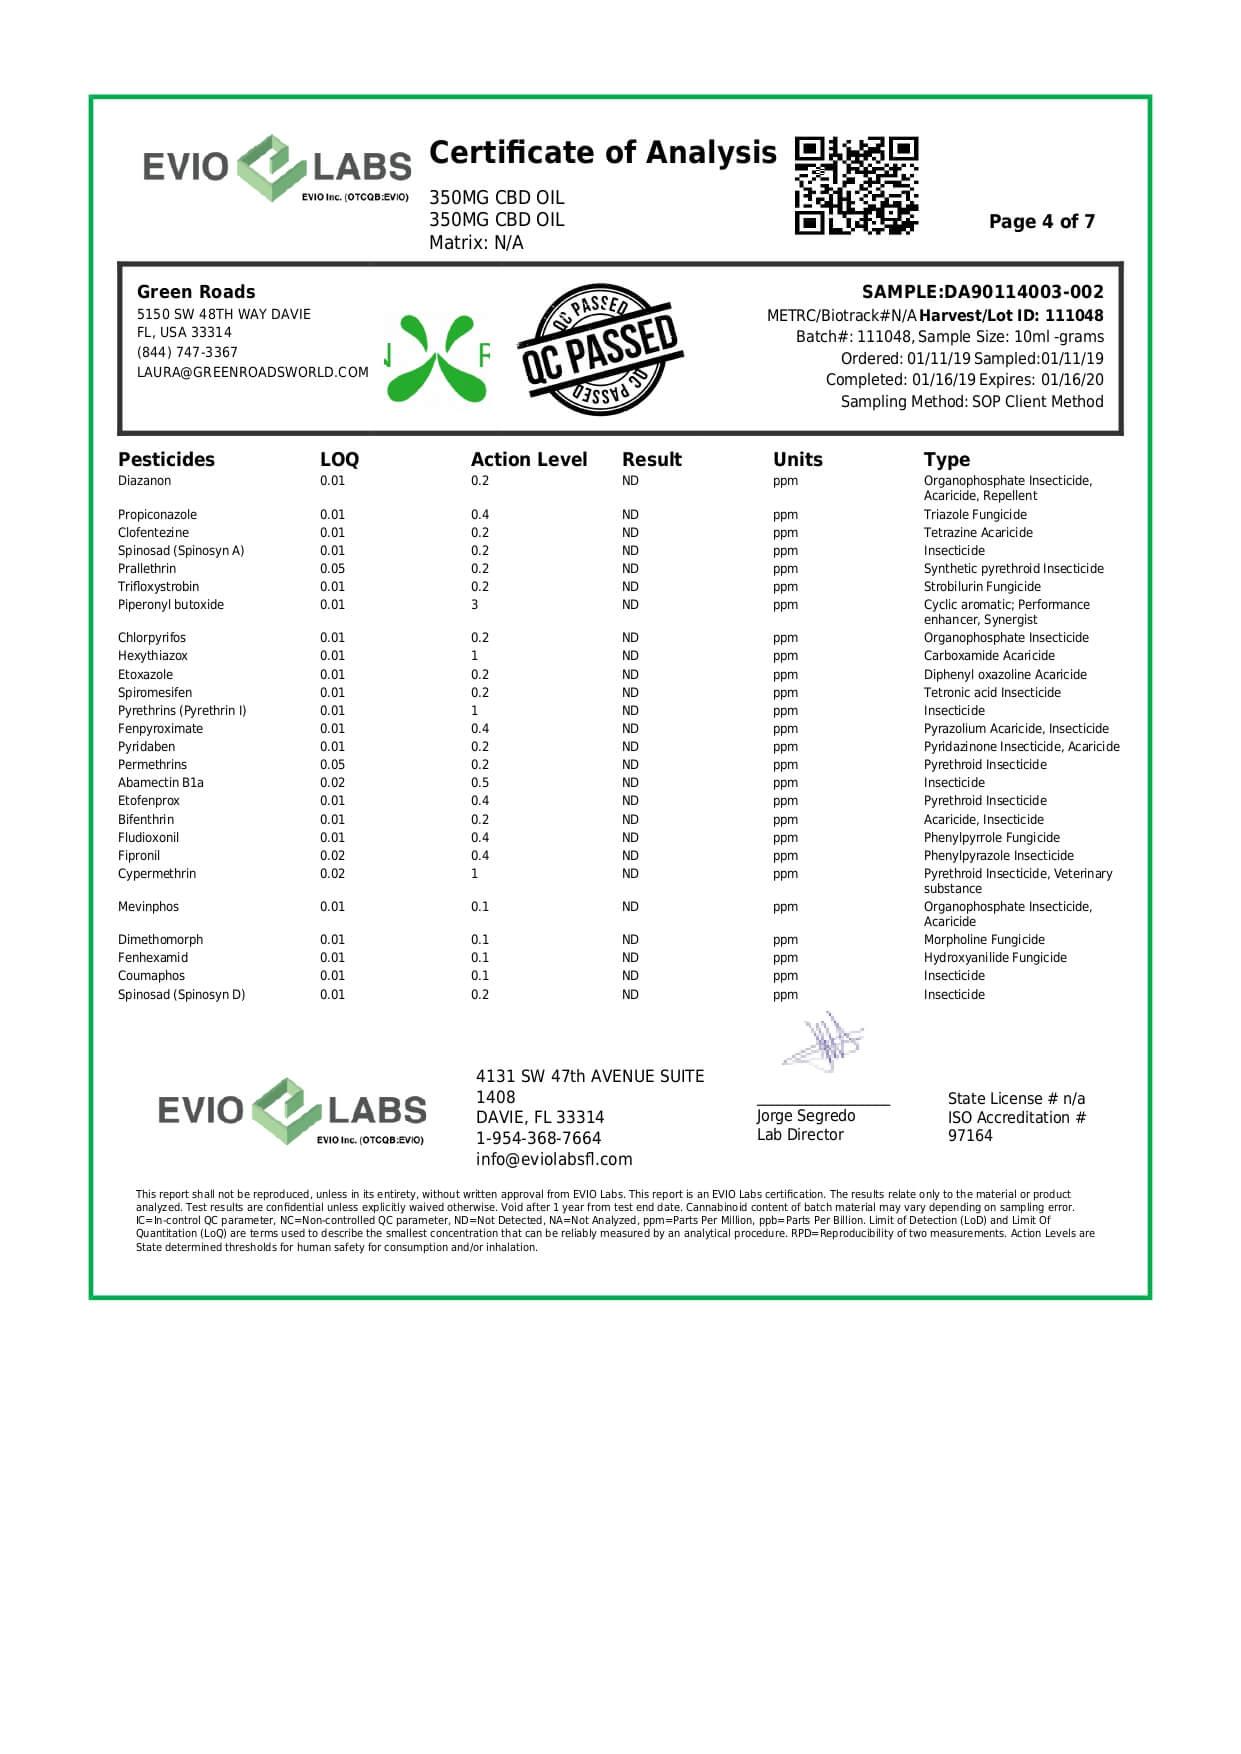 Green Roads CBD Daily Dose 350mg Lab Report